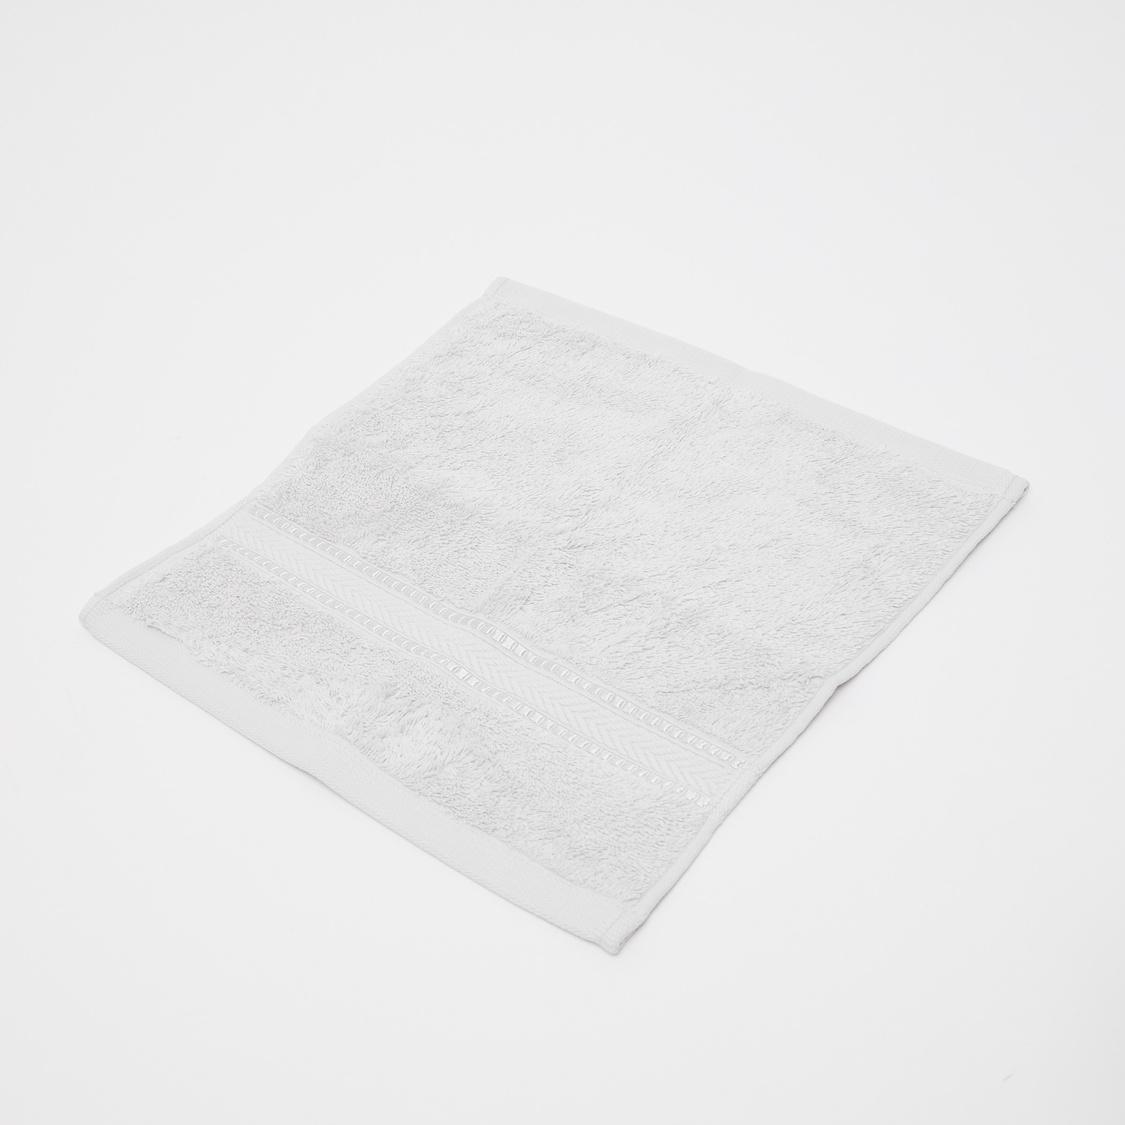 Set of 4 - Textured Egyptian Cotton Face Towel - 30x30 cms